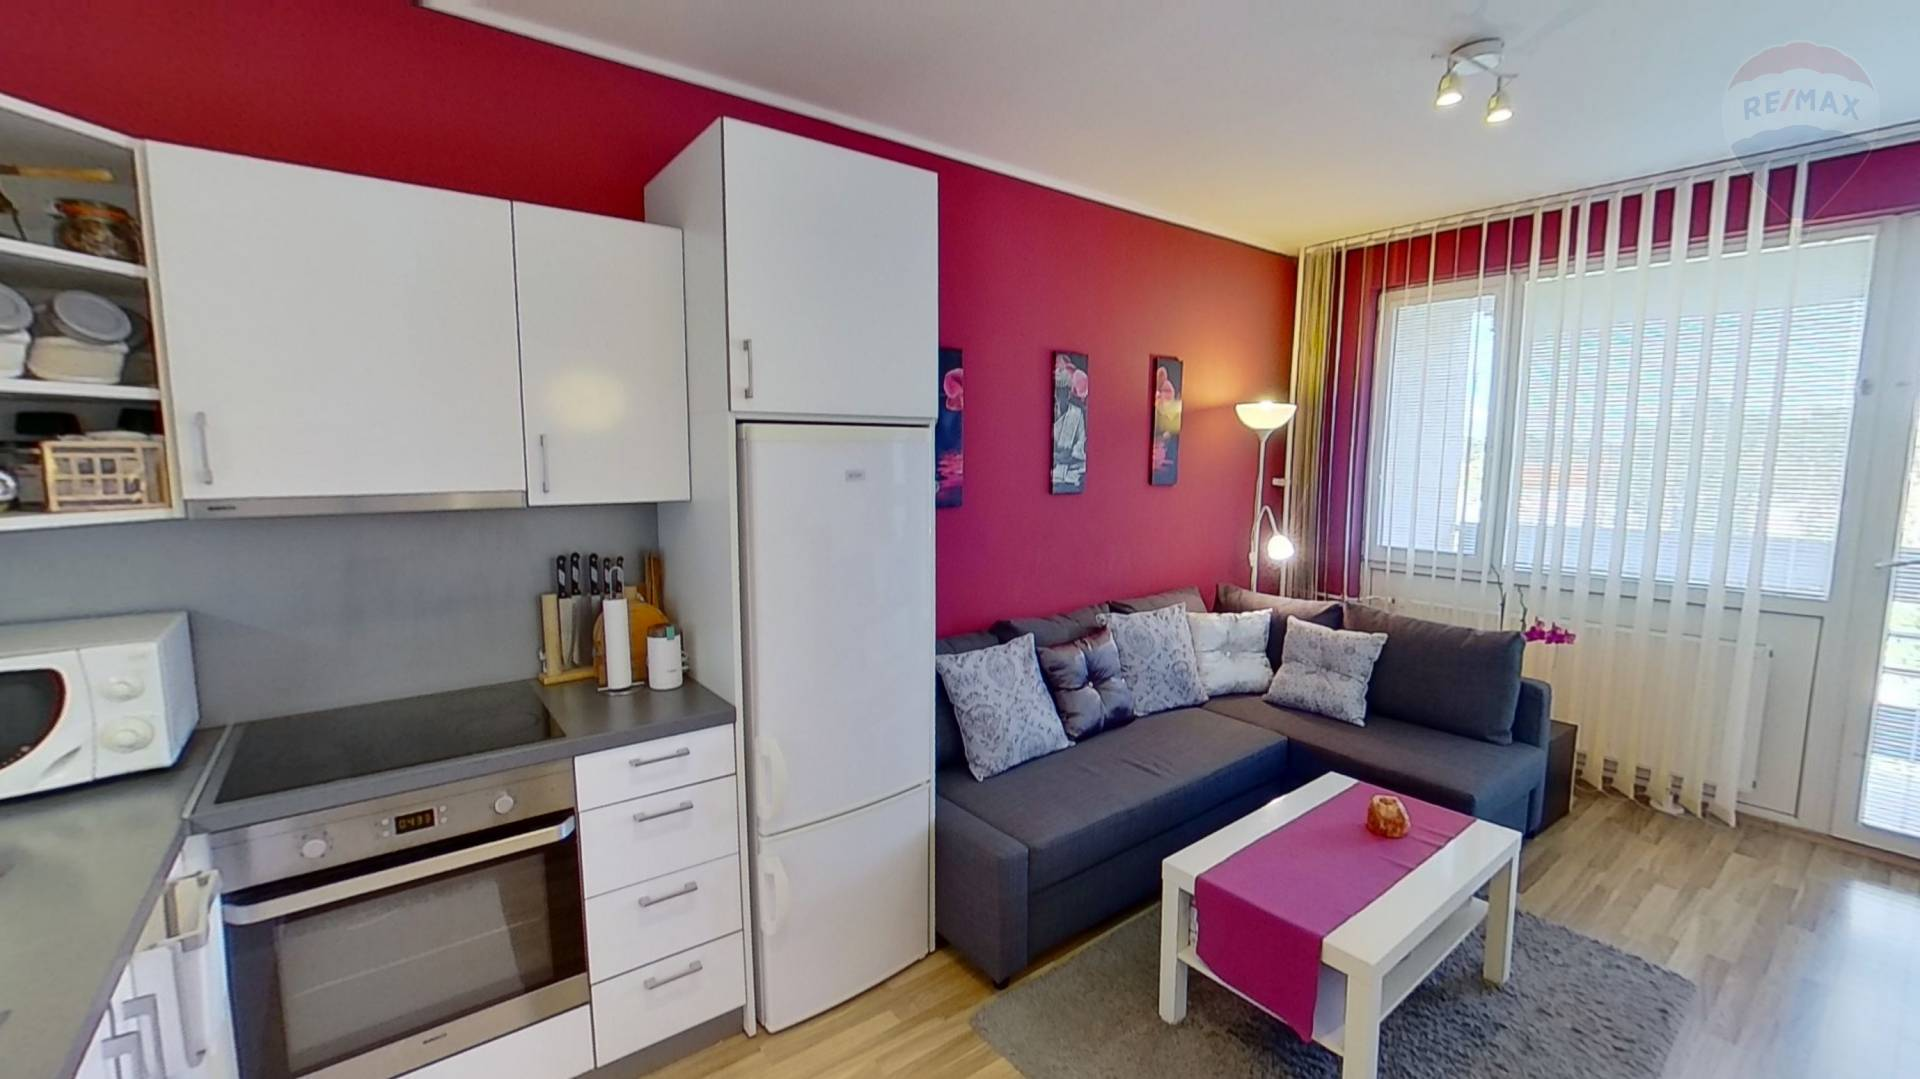 predaj 2 izbový byt Bratislava - Ružinov, Vlčie Hrdlo